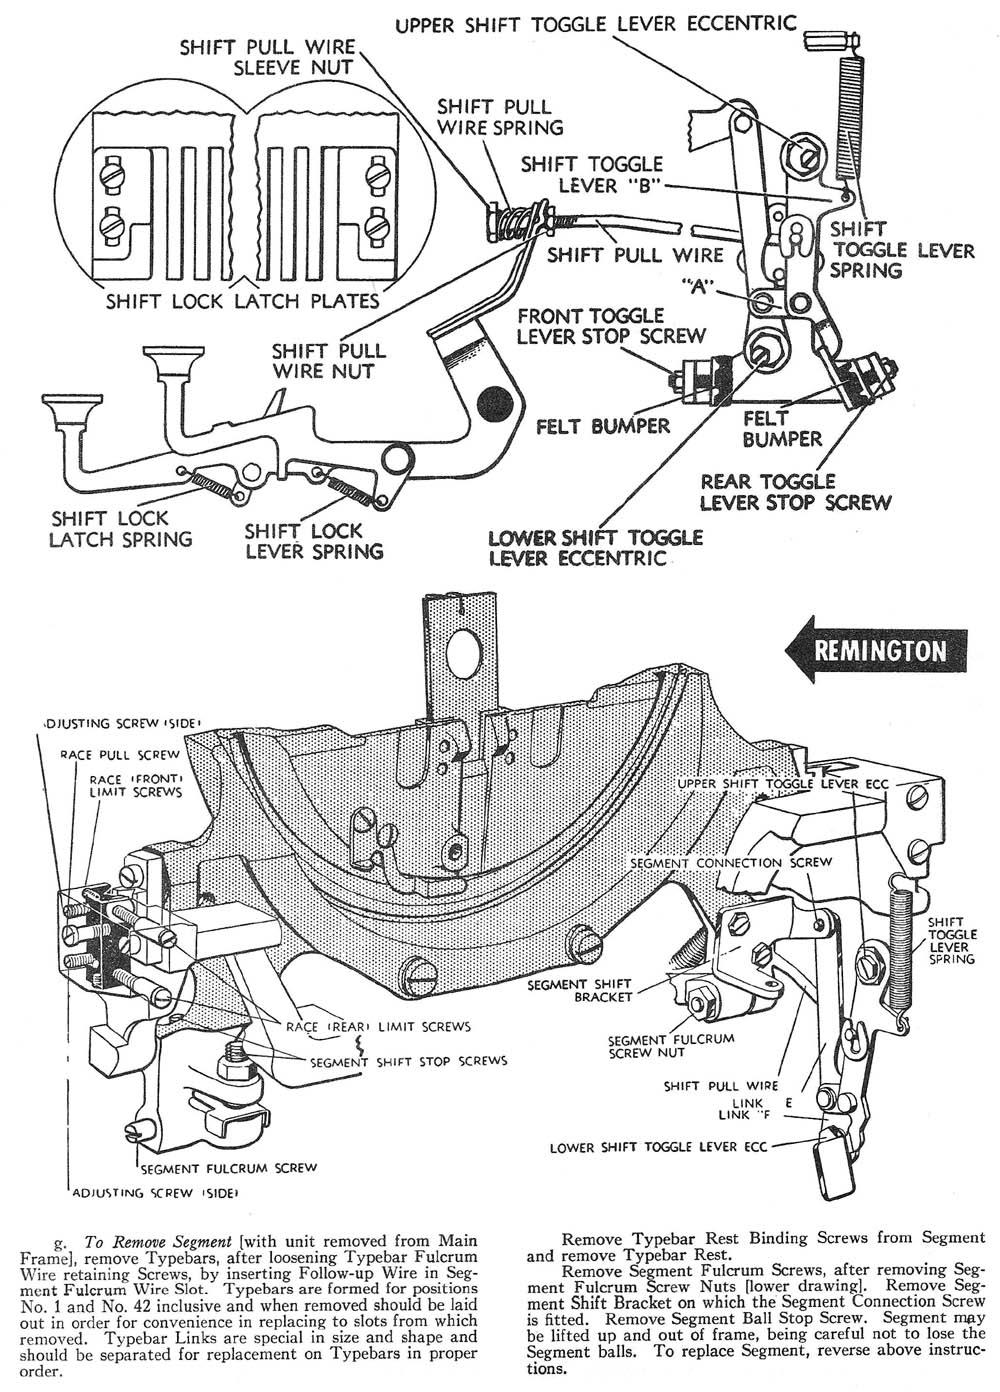 Motion and Shift Mechanism AMES OAMI Mechanical Training